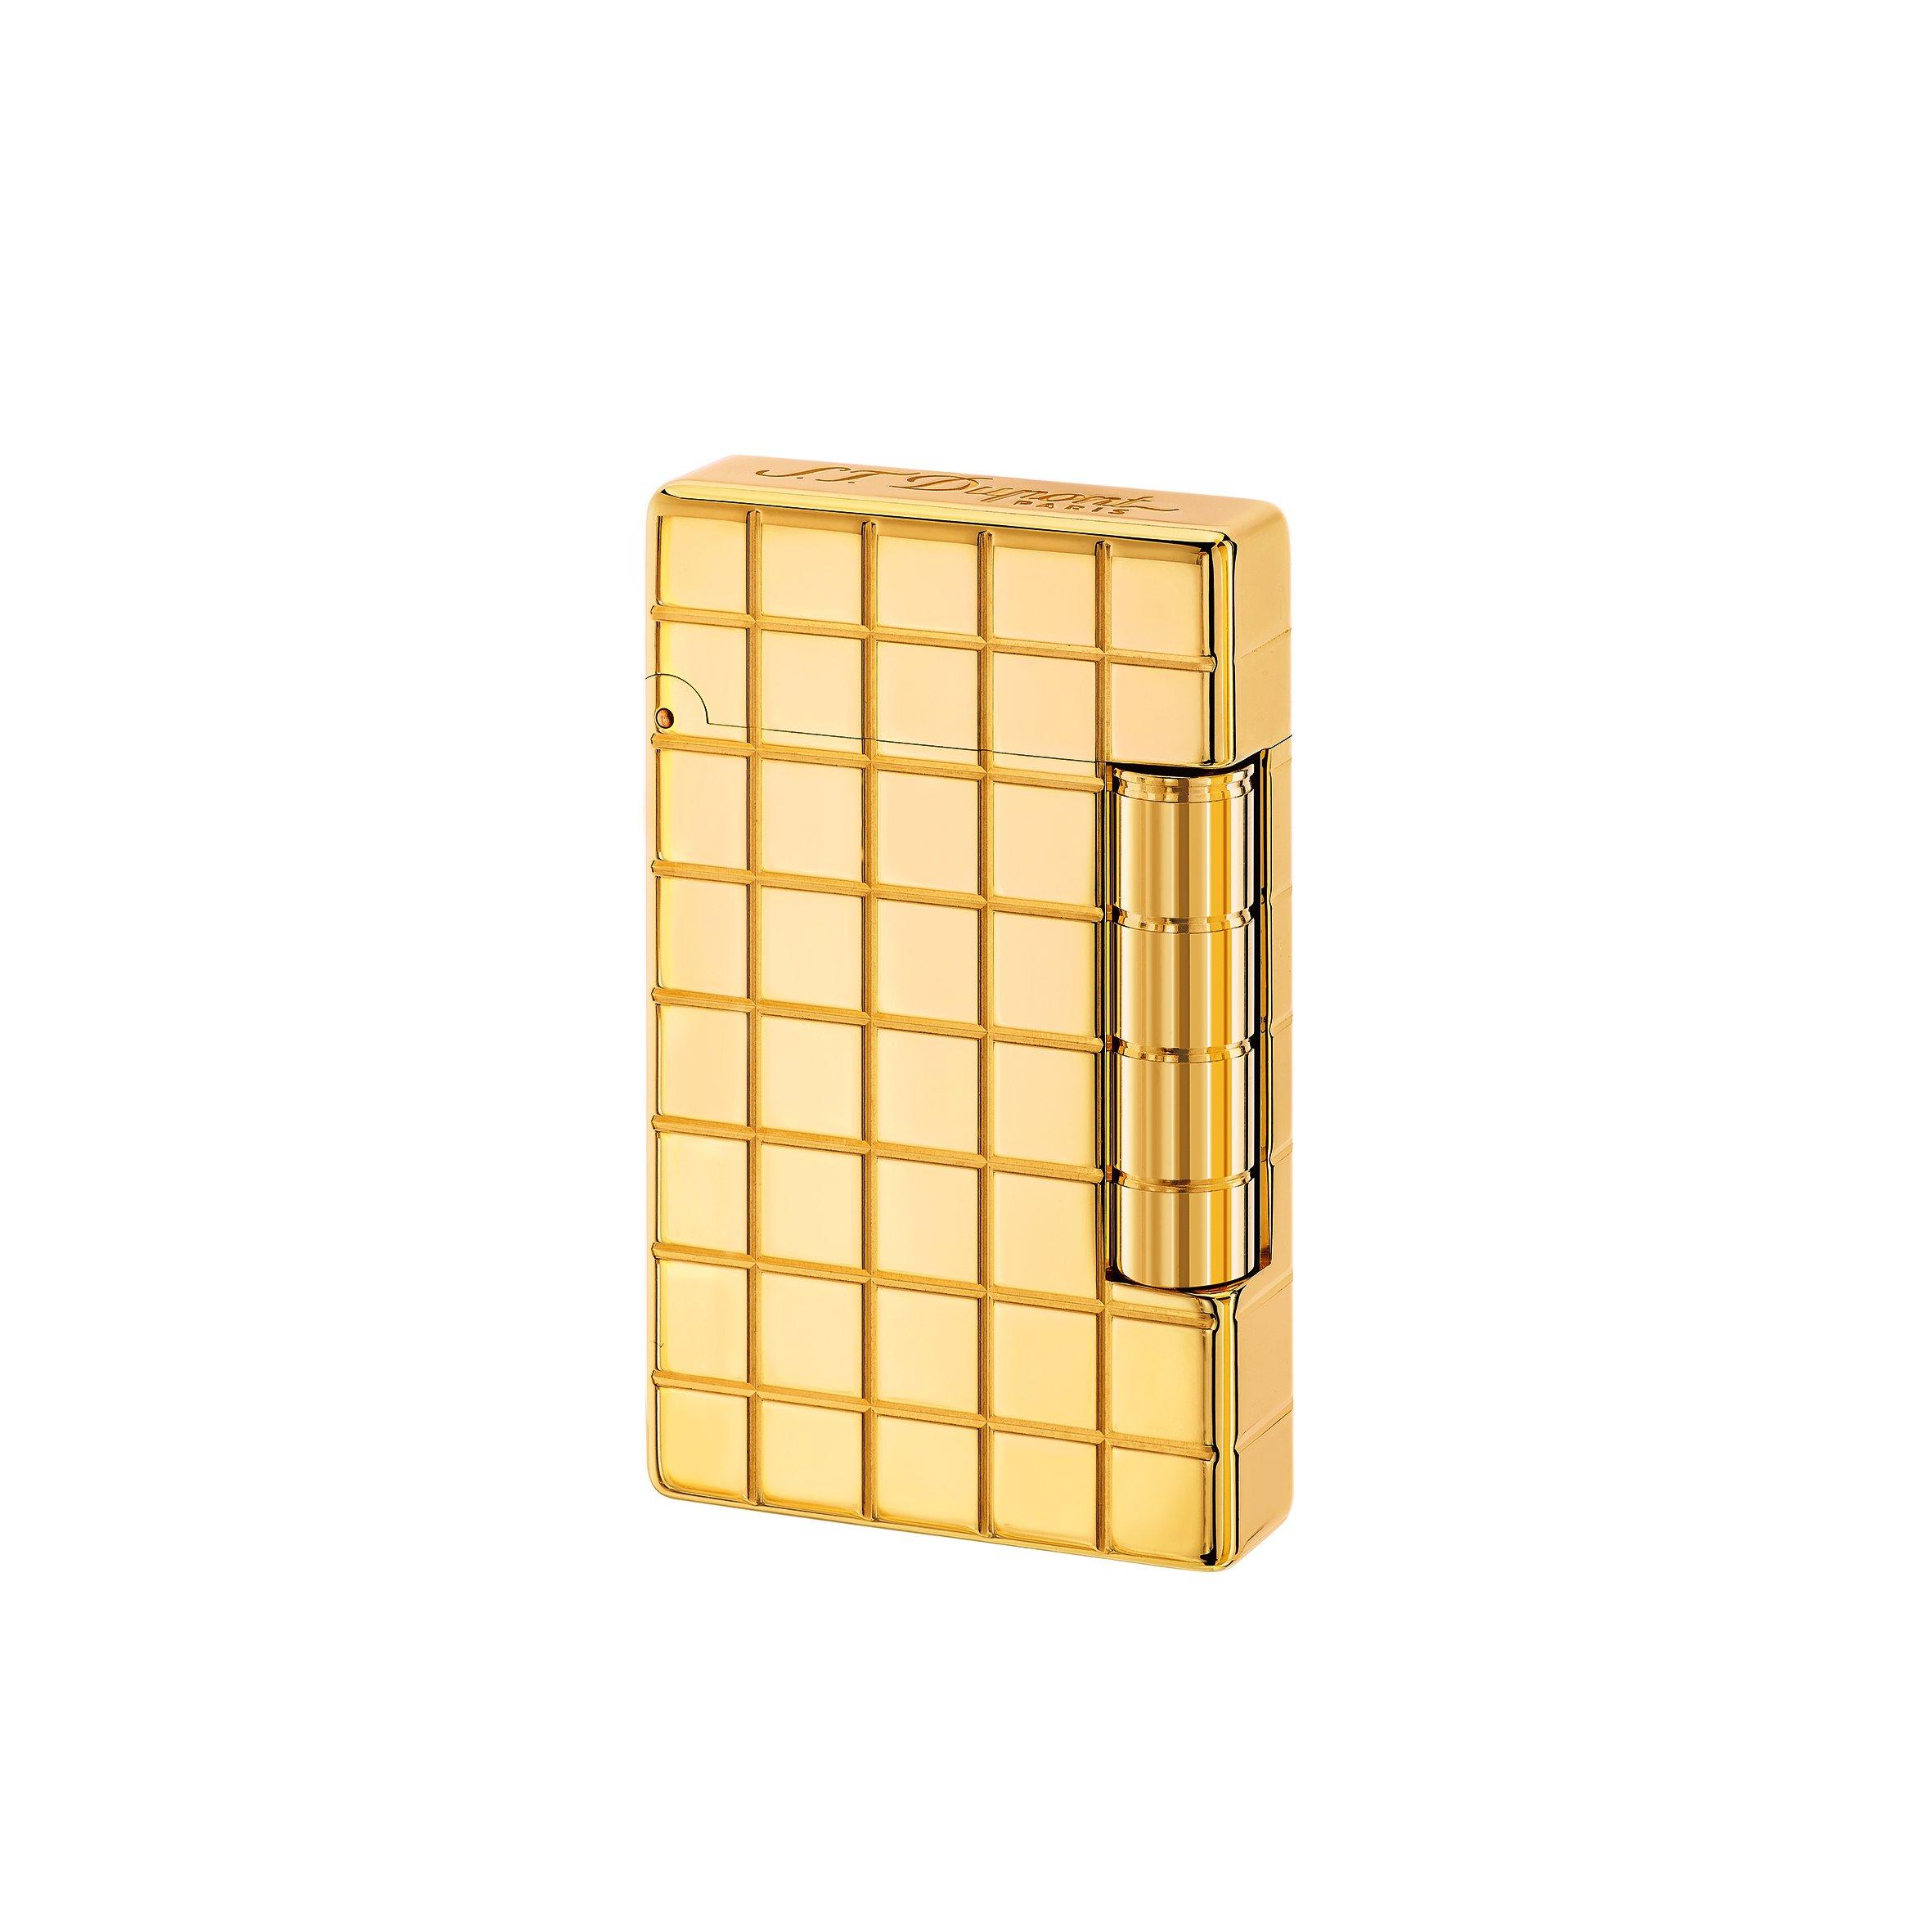 S.T. Dupont ''Initial'' Square Golden Bronze Finish Flint Lighter 2017 / 020801